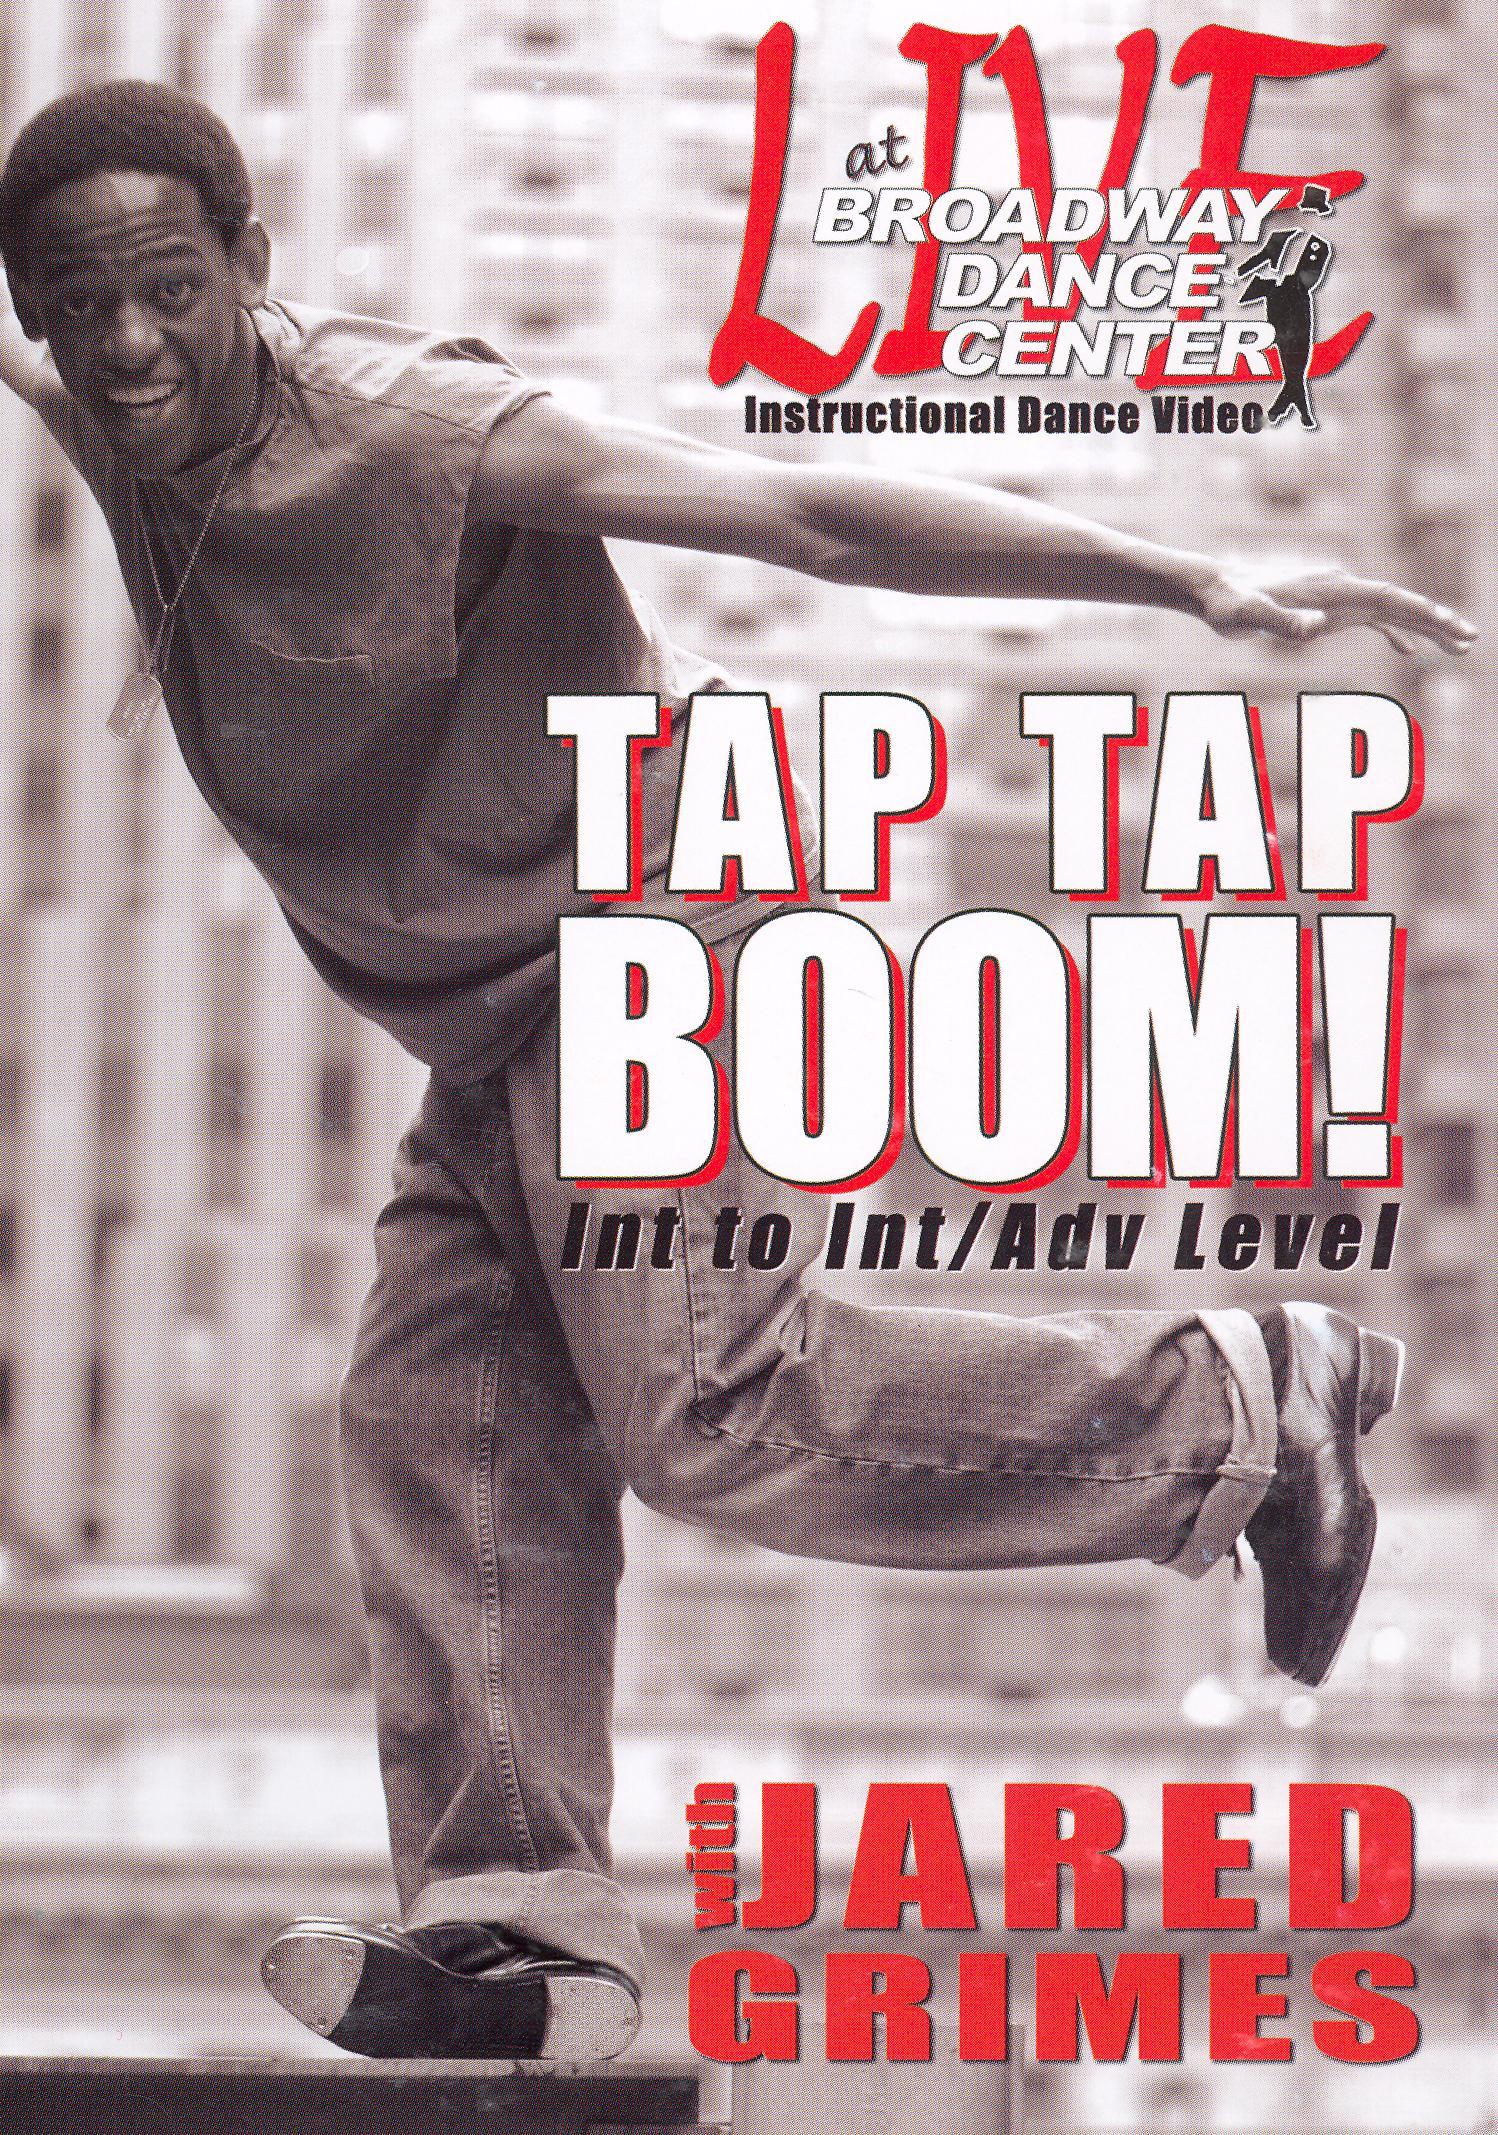 Broadway Dance Center: Tapdance Tap...Tap...Boom!